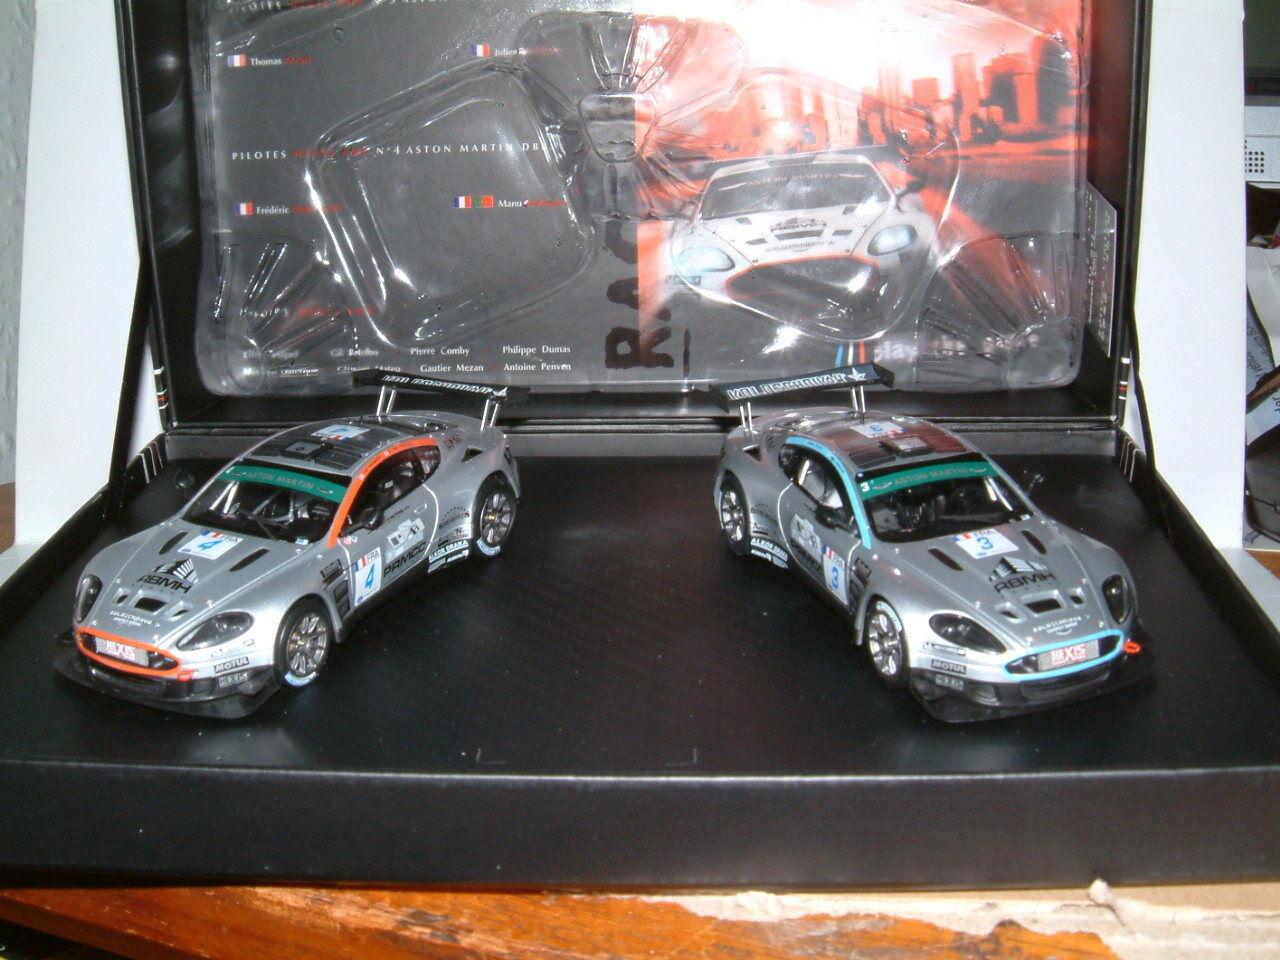 1 43 NOREV ASTON MARTIN DBRS9 2009 TEAM HEXIS AMR, 1000 LIMITED ED 2 CAR SET